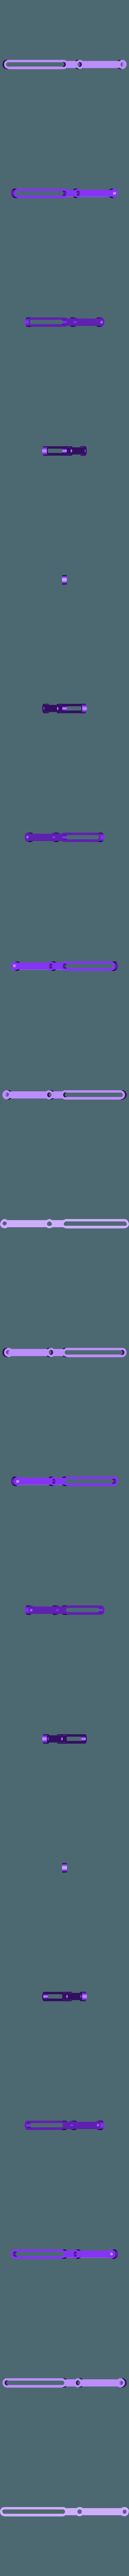 Arm_Wheel.stl Download free STL file Marblevator, Mechanisms • Object to 3D print, gzumwalt